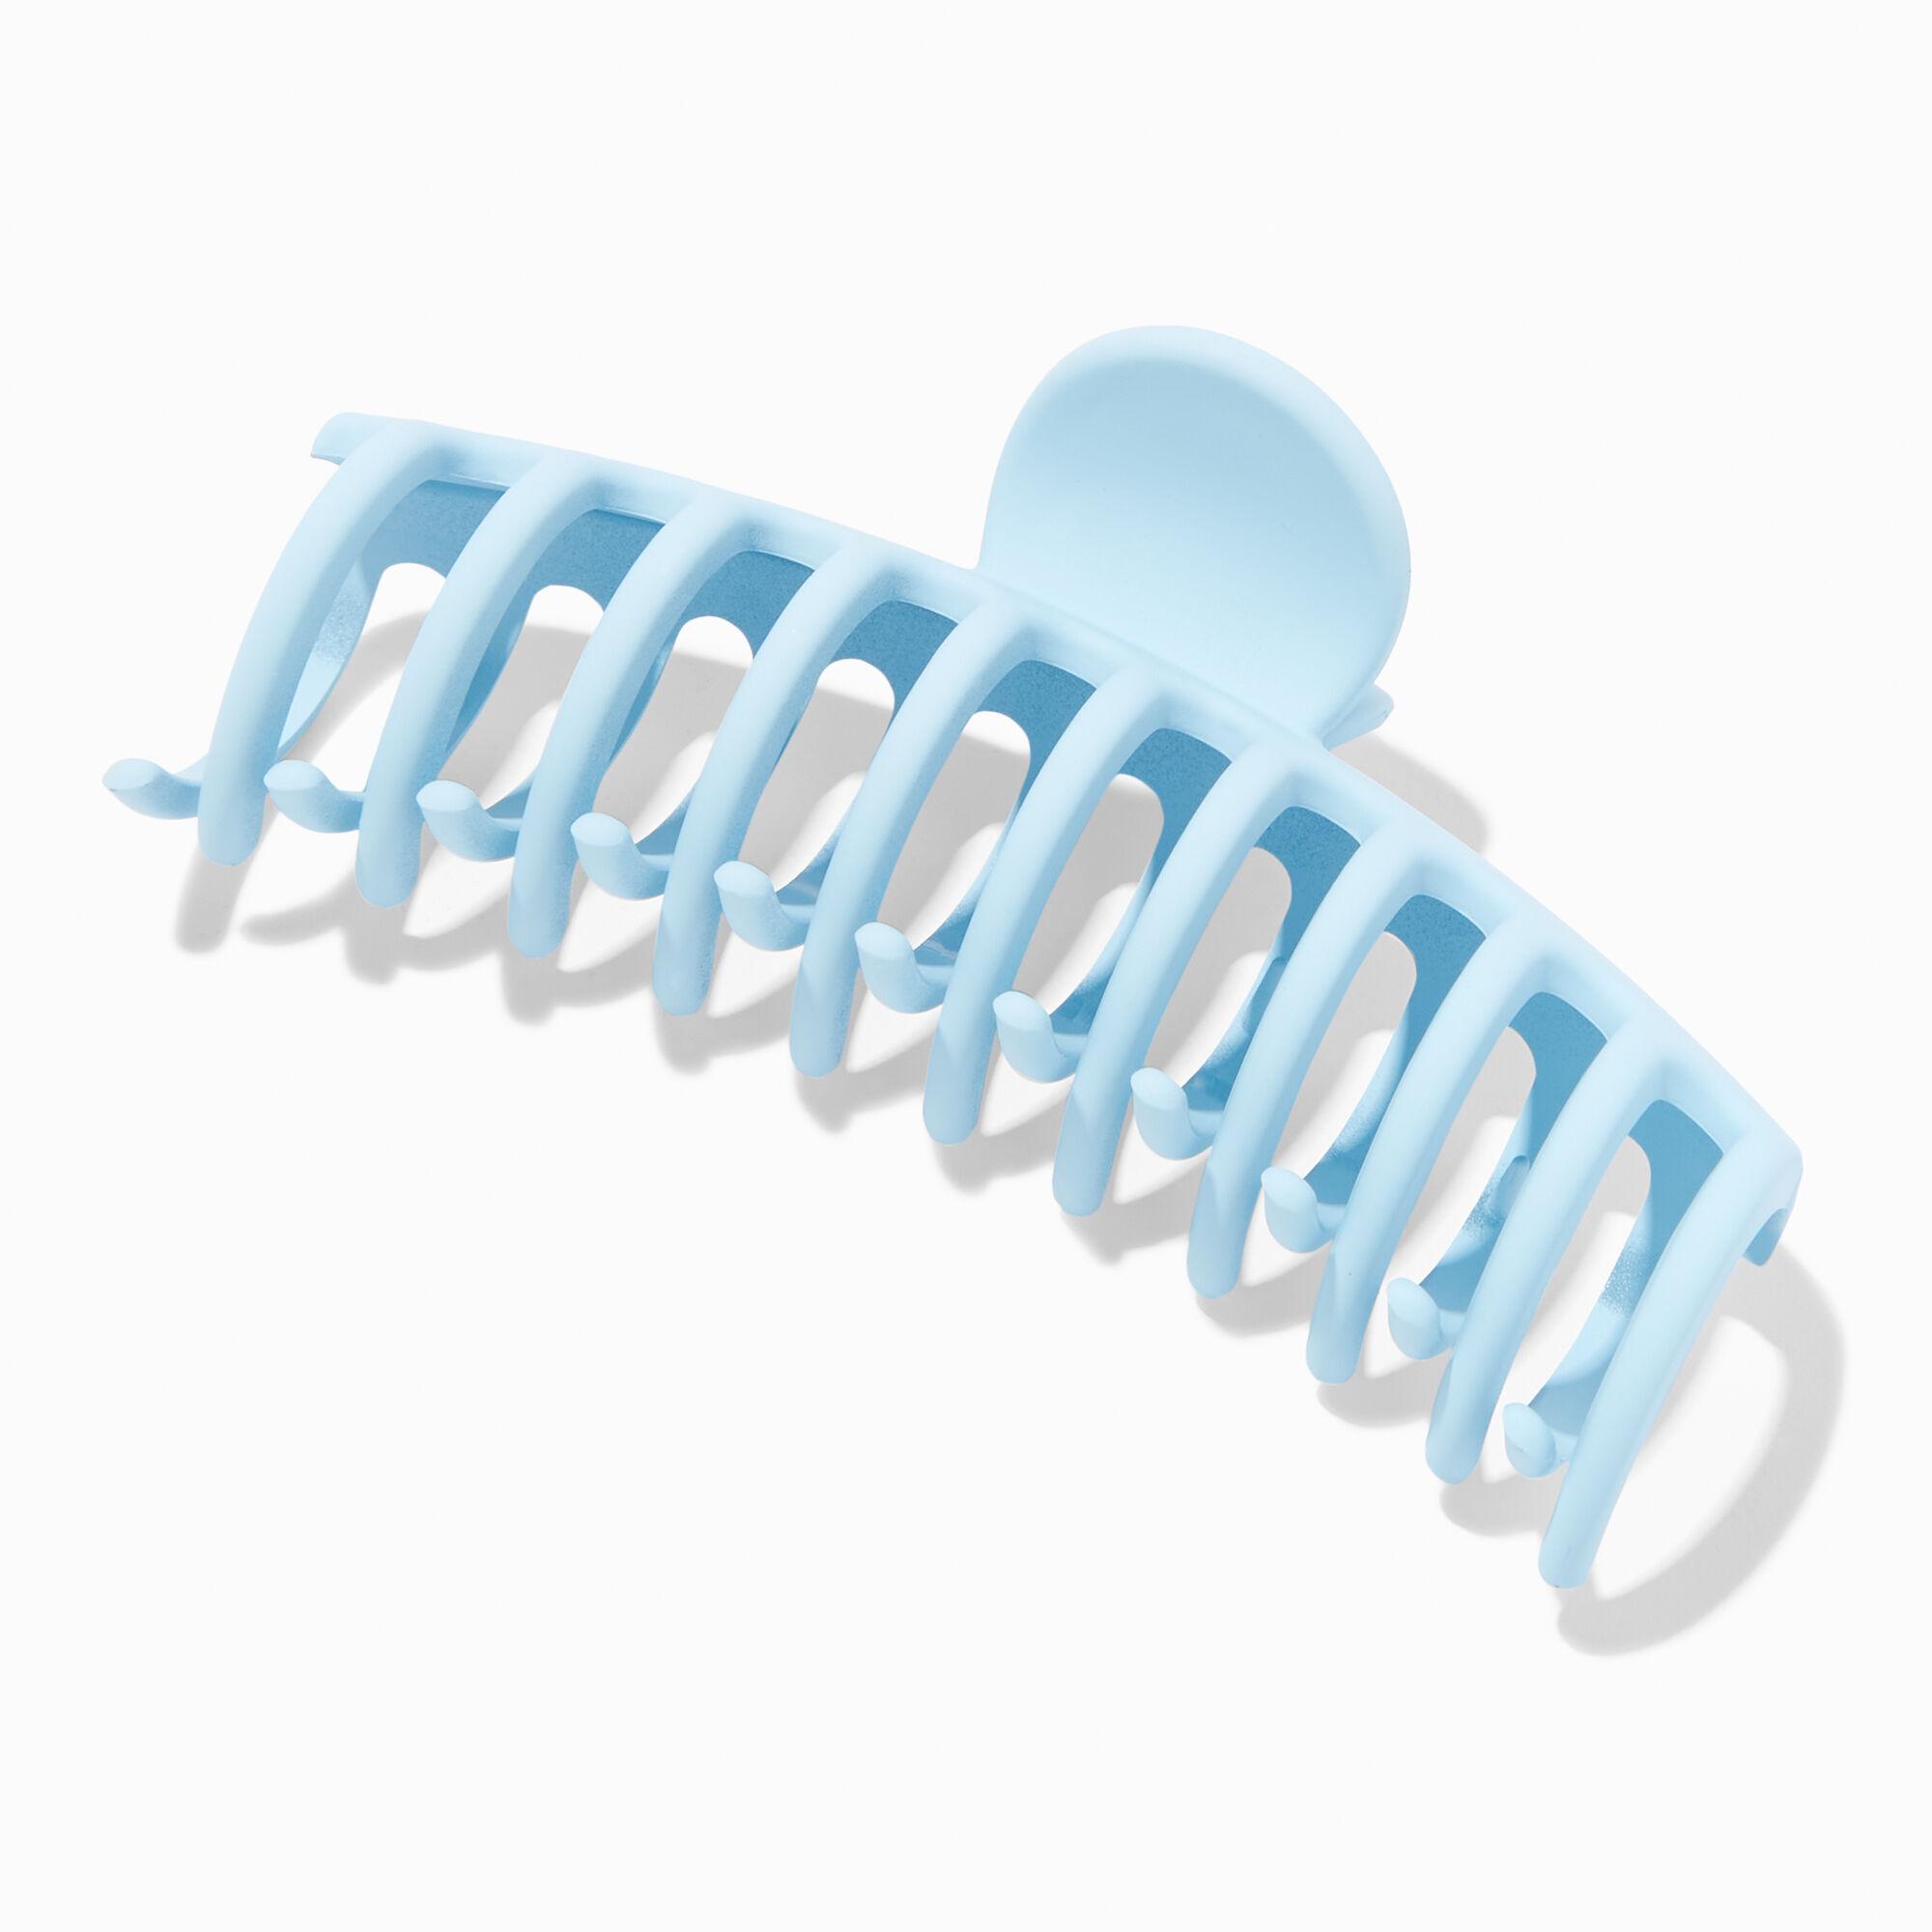 Sterling Silver Infinity Symbol Stud Earrings Icing Us